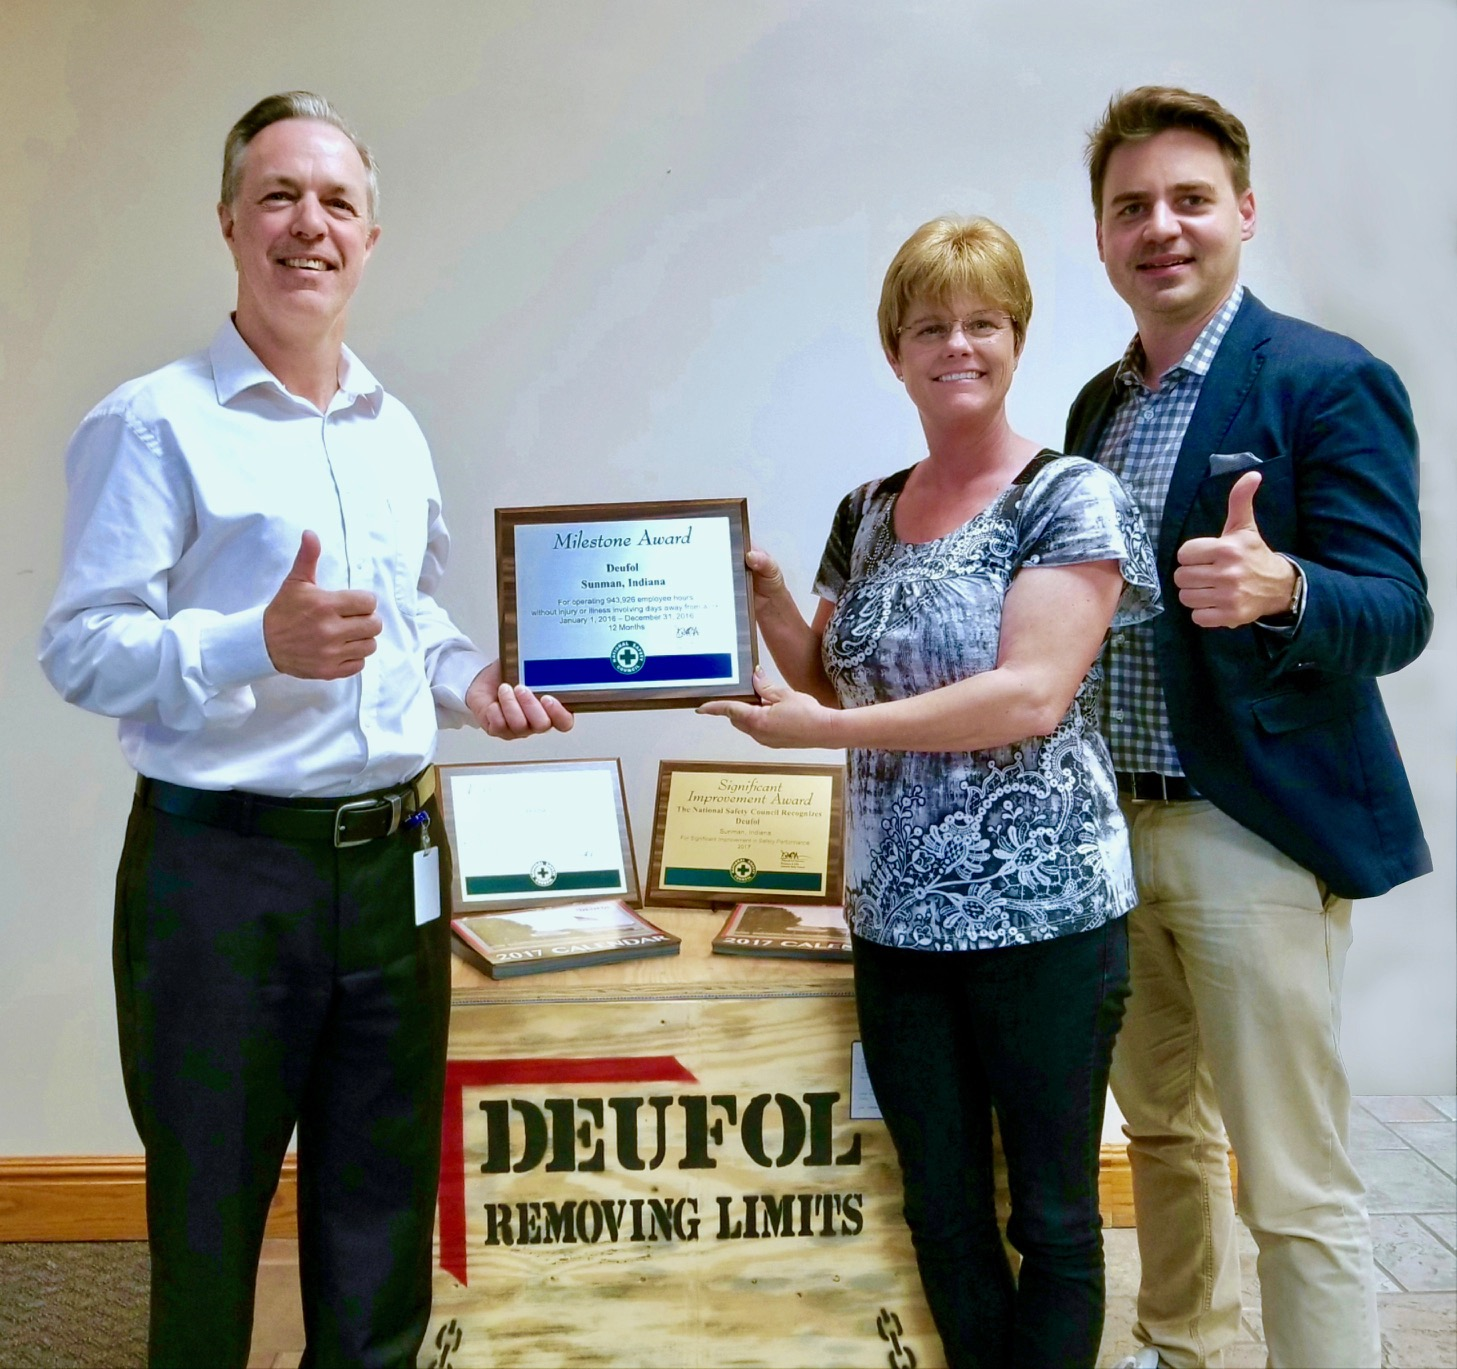 Deufol-Safety-Awards-National-Council